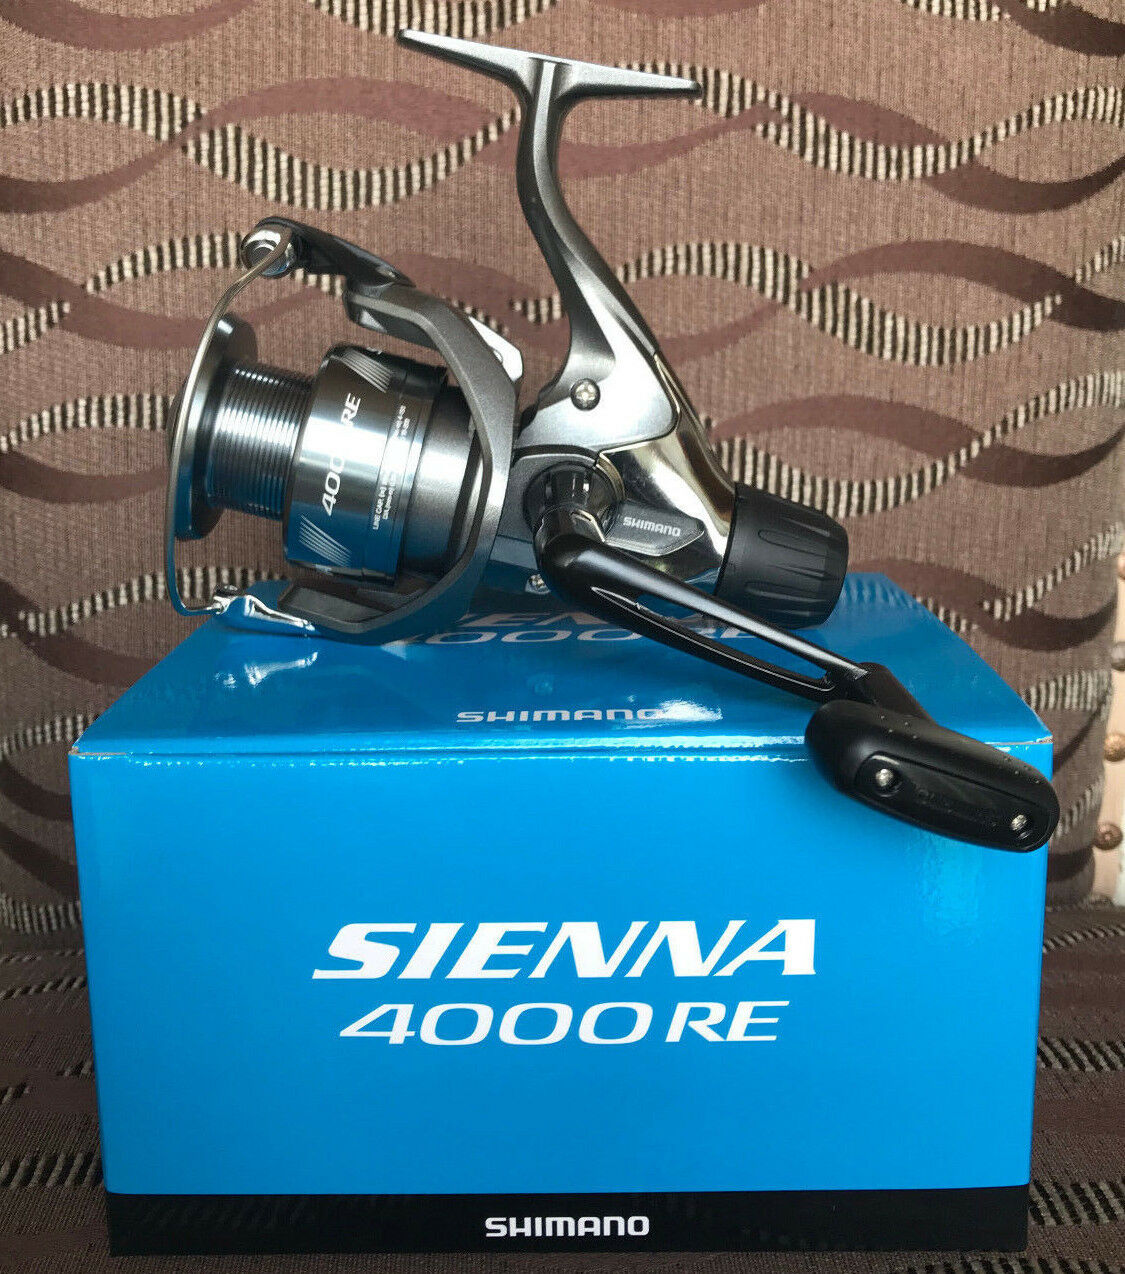 Shimano Sienna 4000 RE Spinnrolle